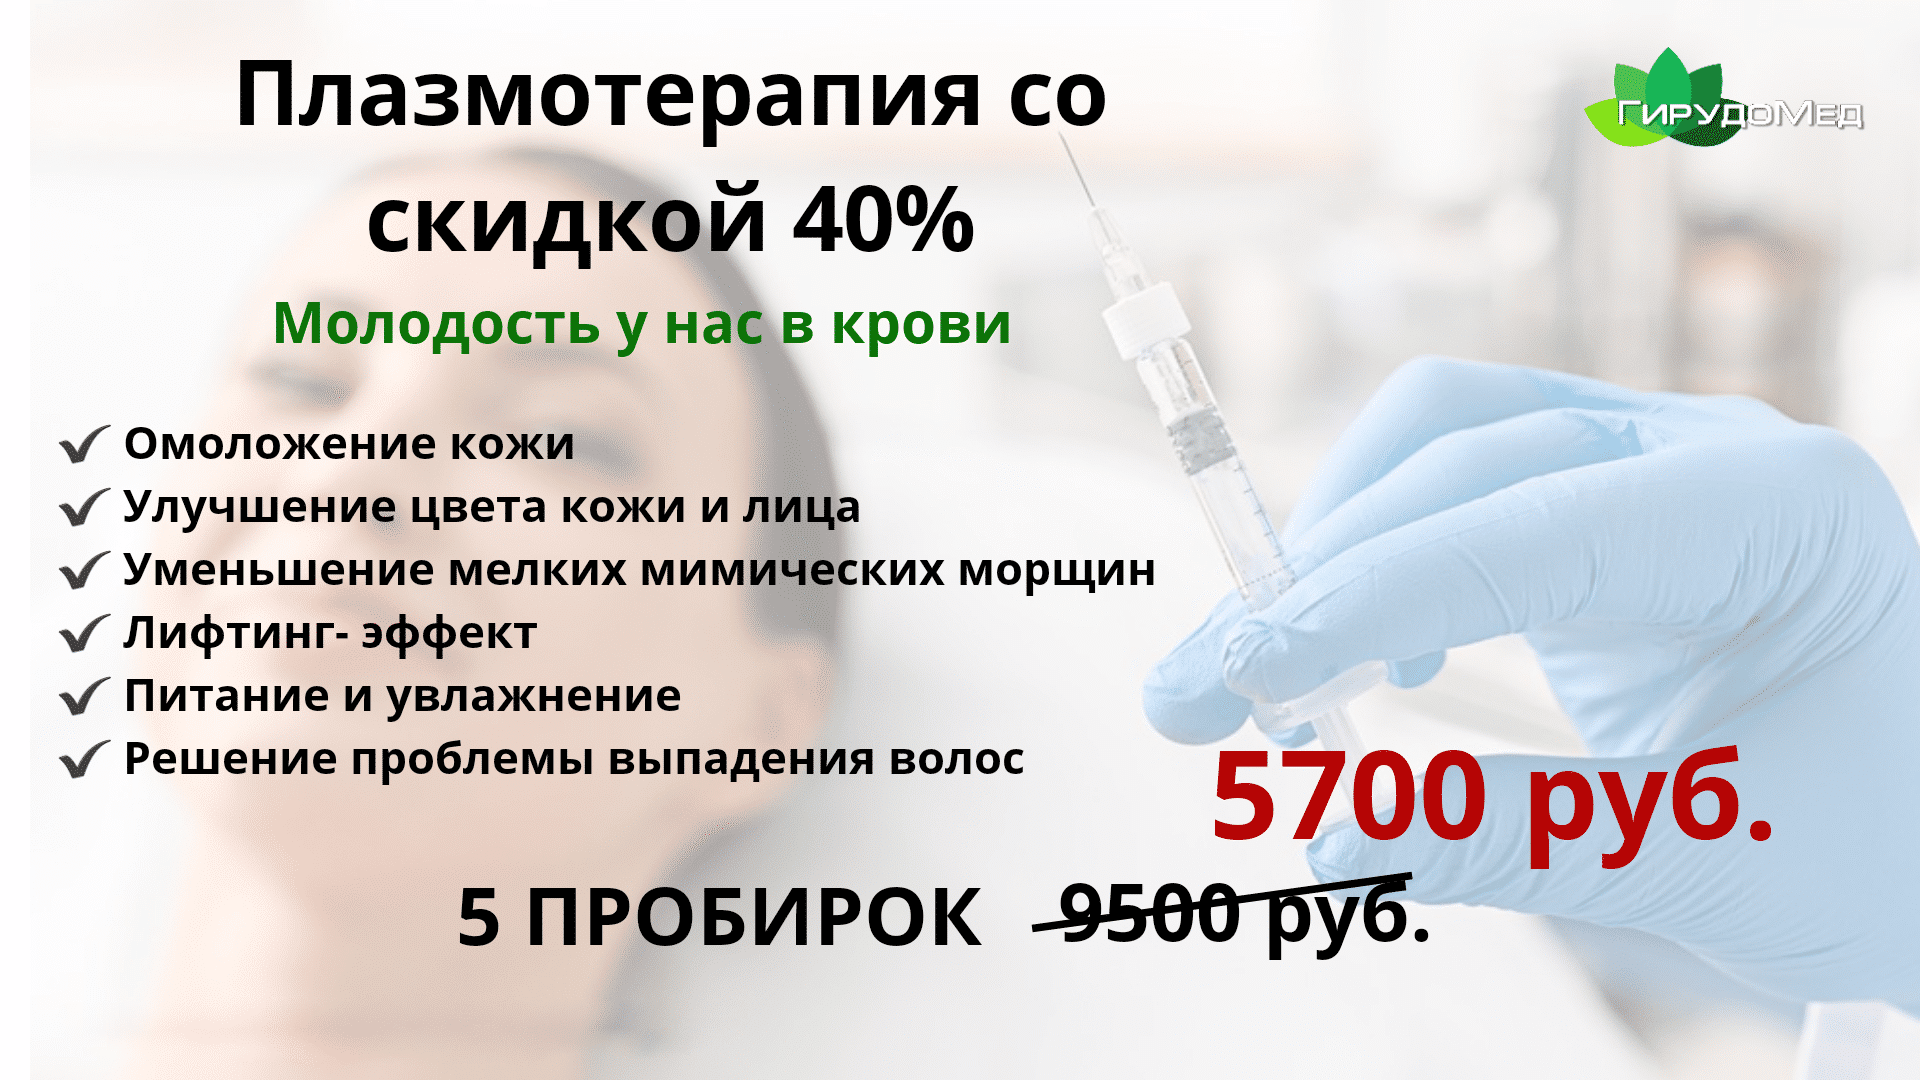 20200707_125029_0000 (1)